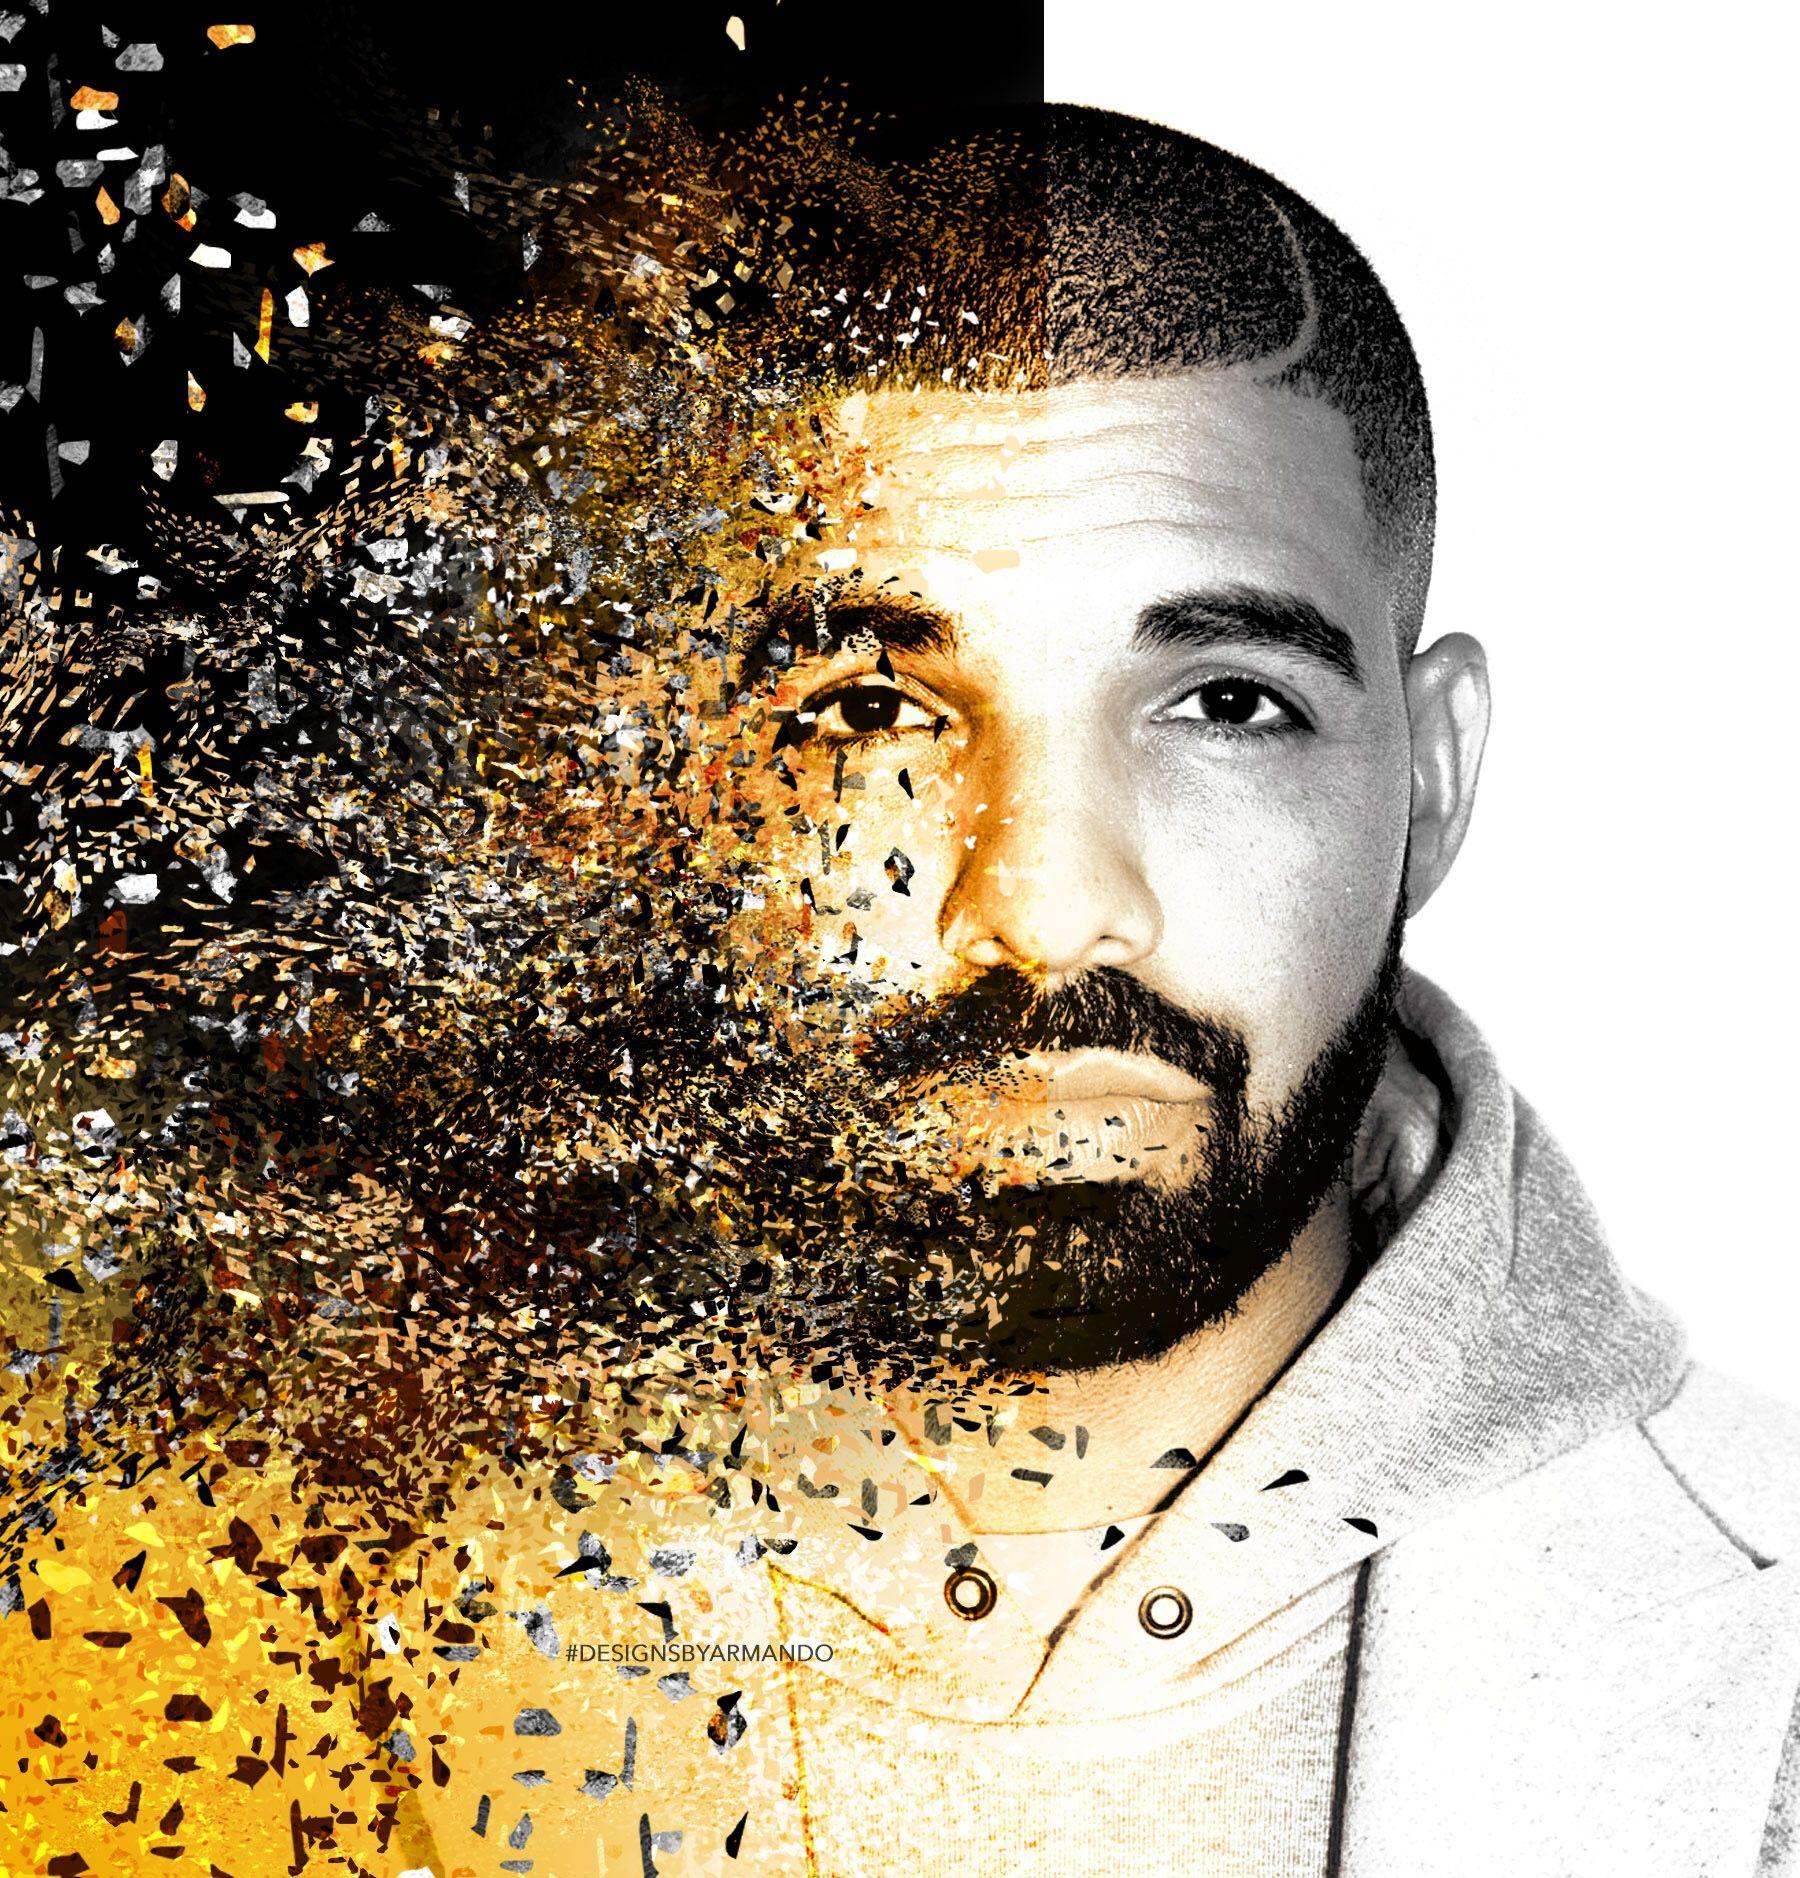 Drizzy Drake Album Cover  Creative artwork Digital Art Graphic